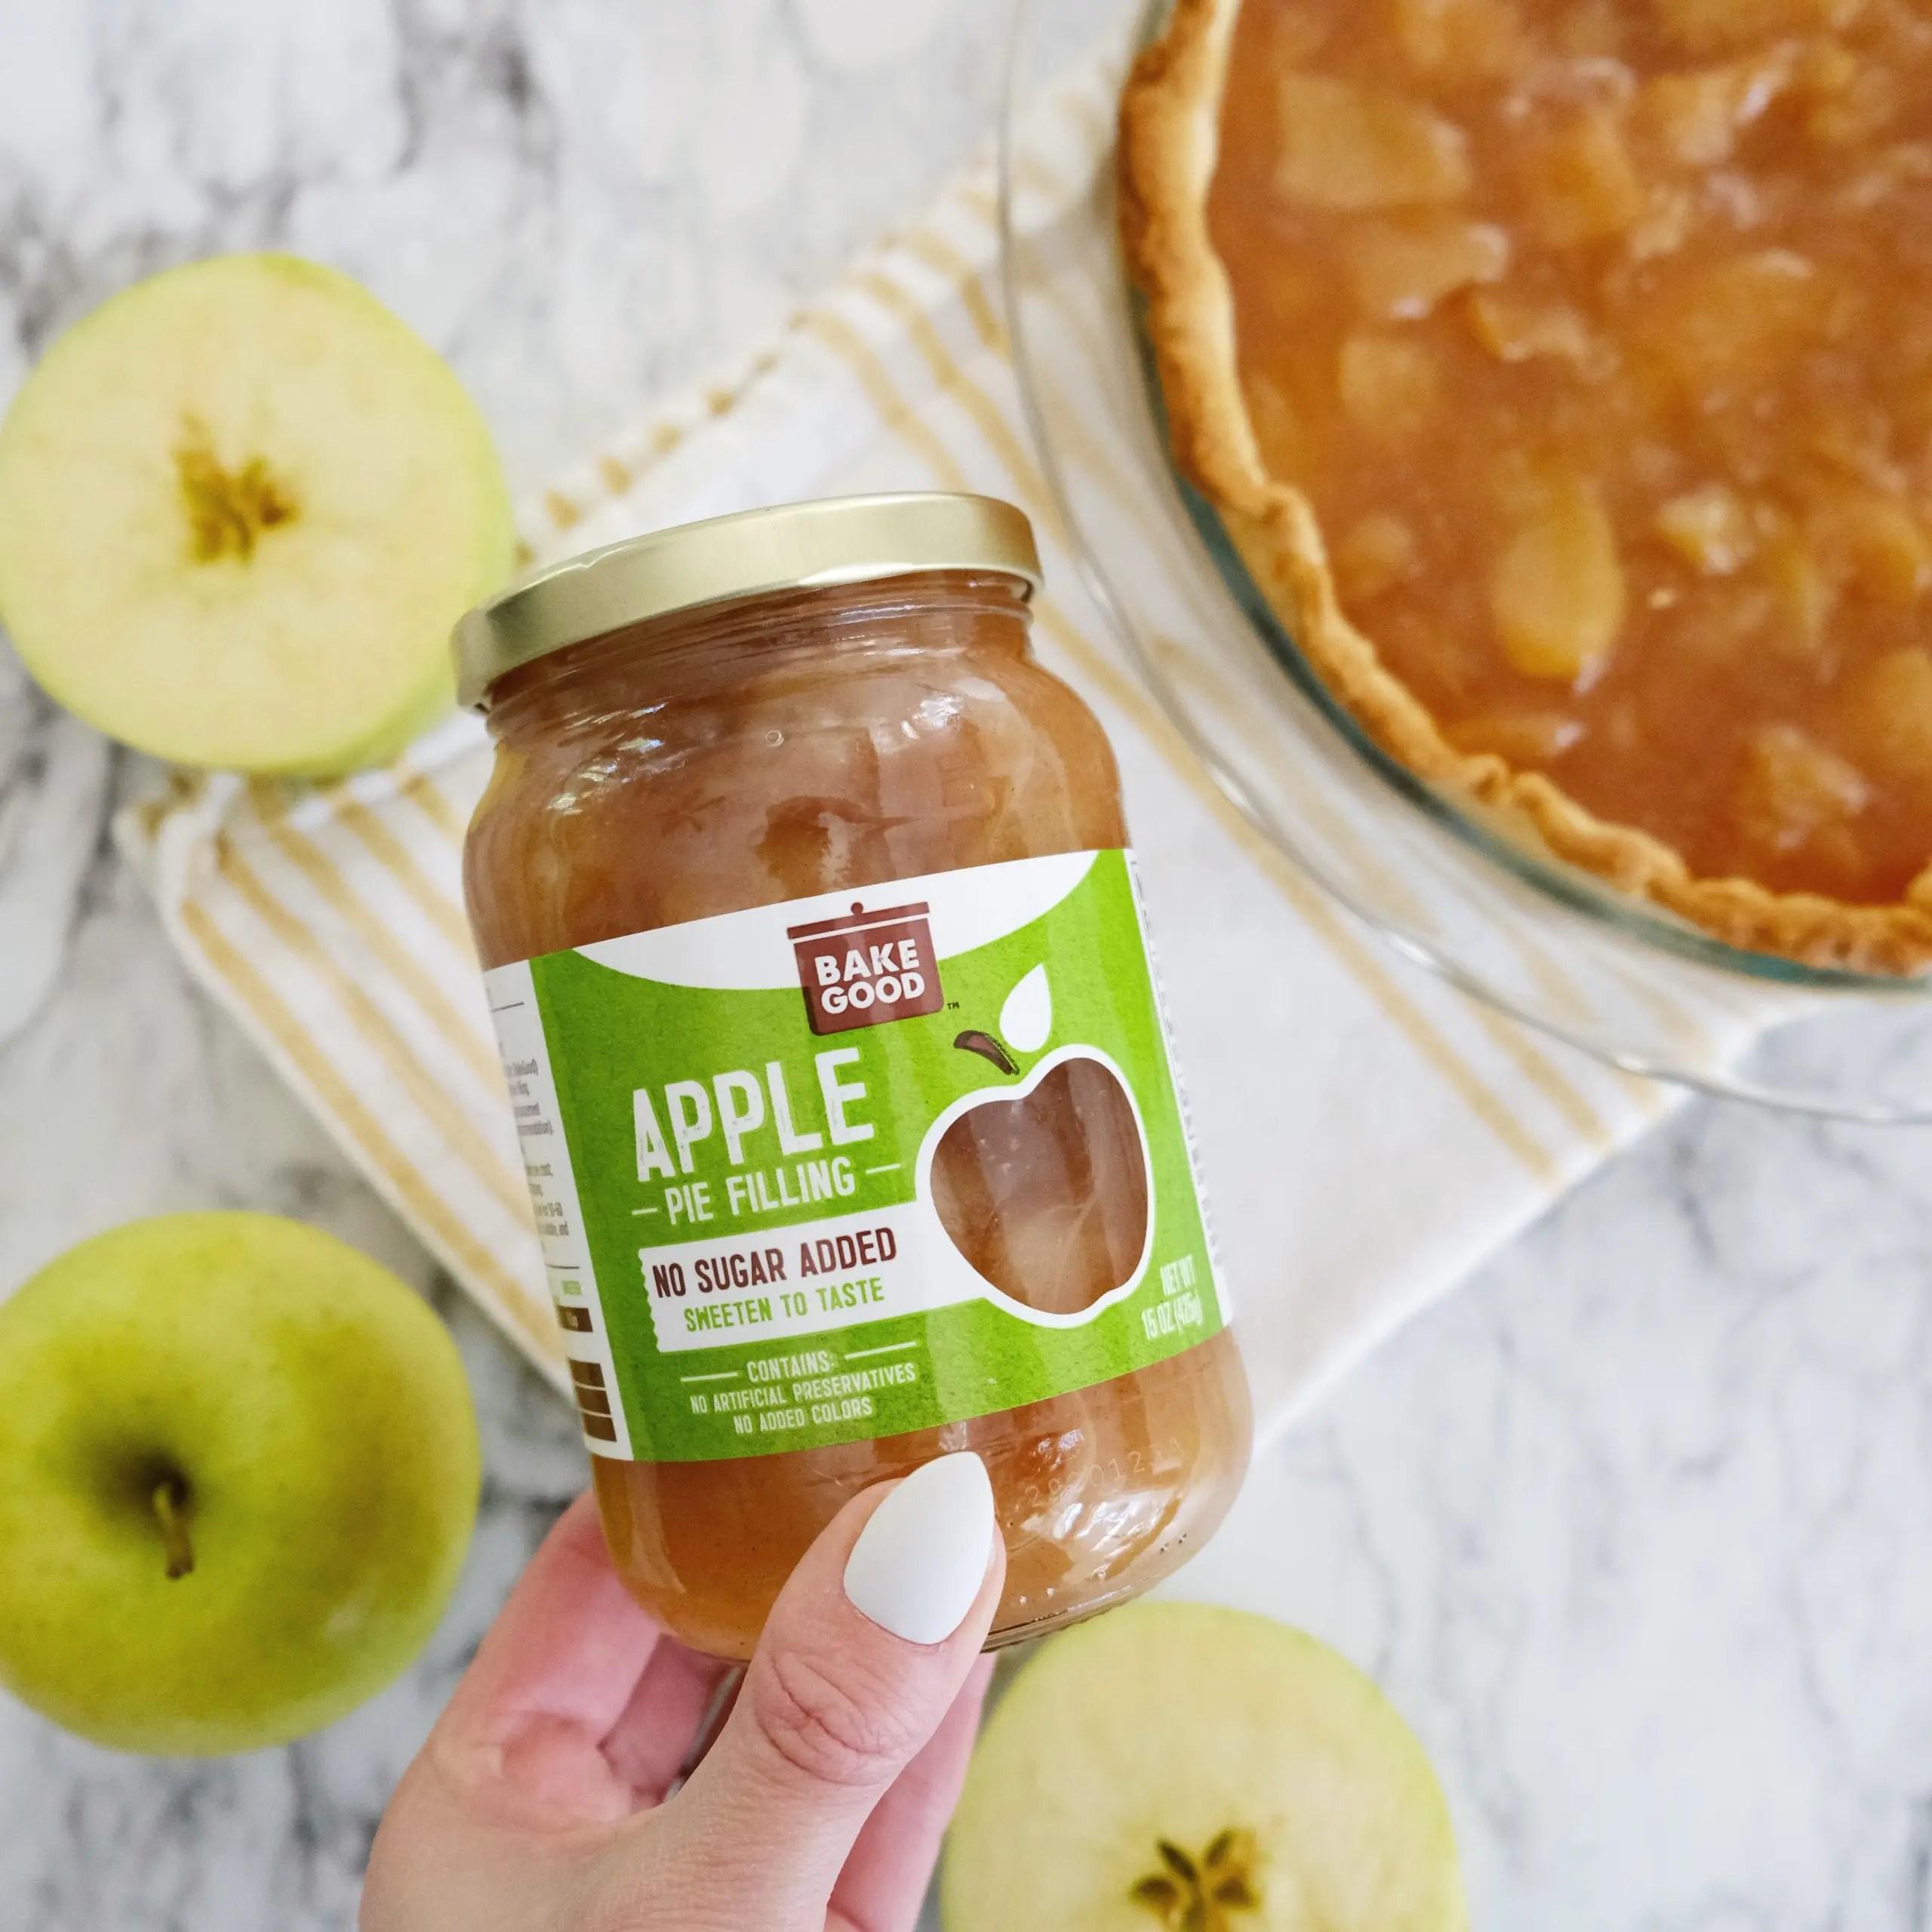 BakeGood Apple Pie Filling